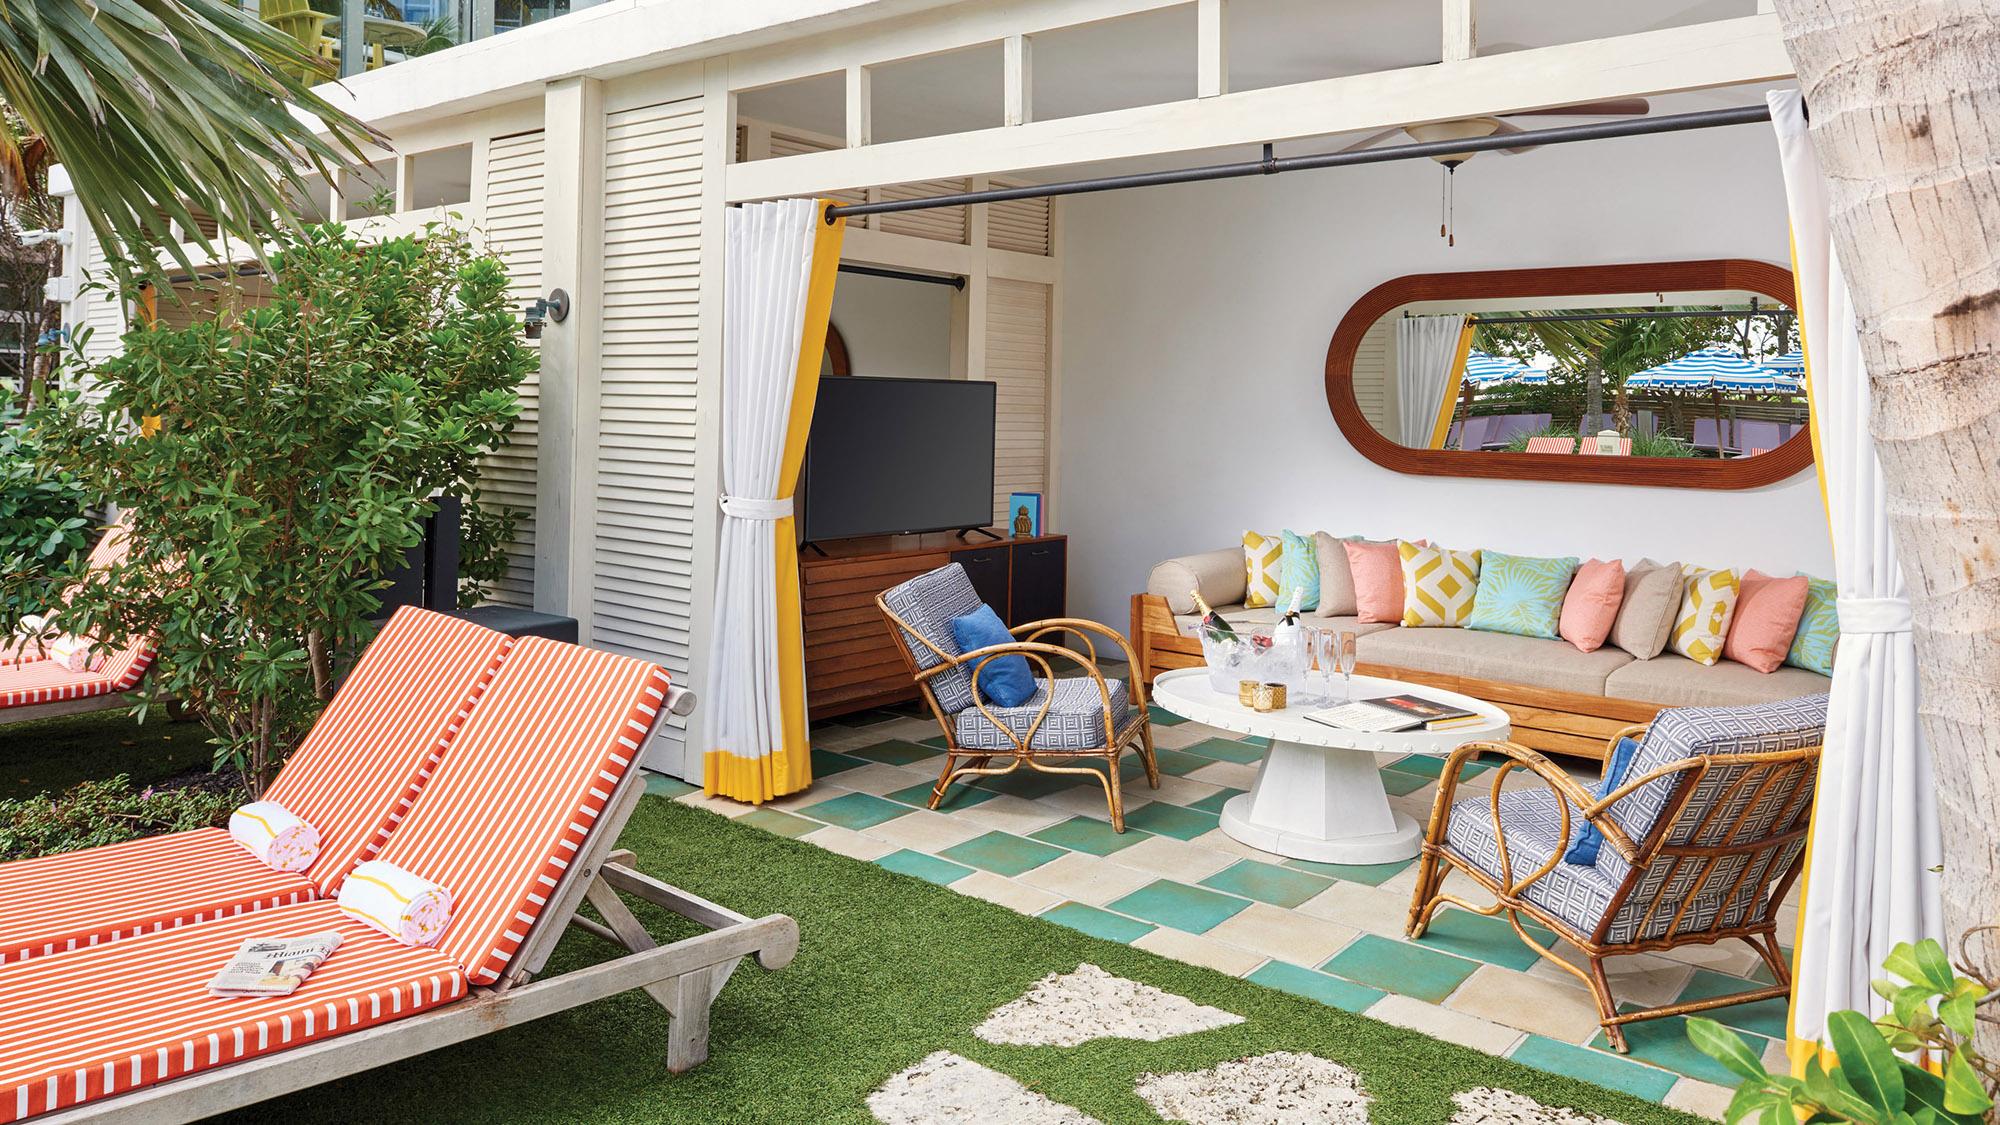 Bungalow Miami miami s confidante creates bubbly and bungalow plan